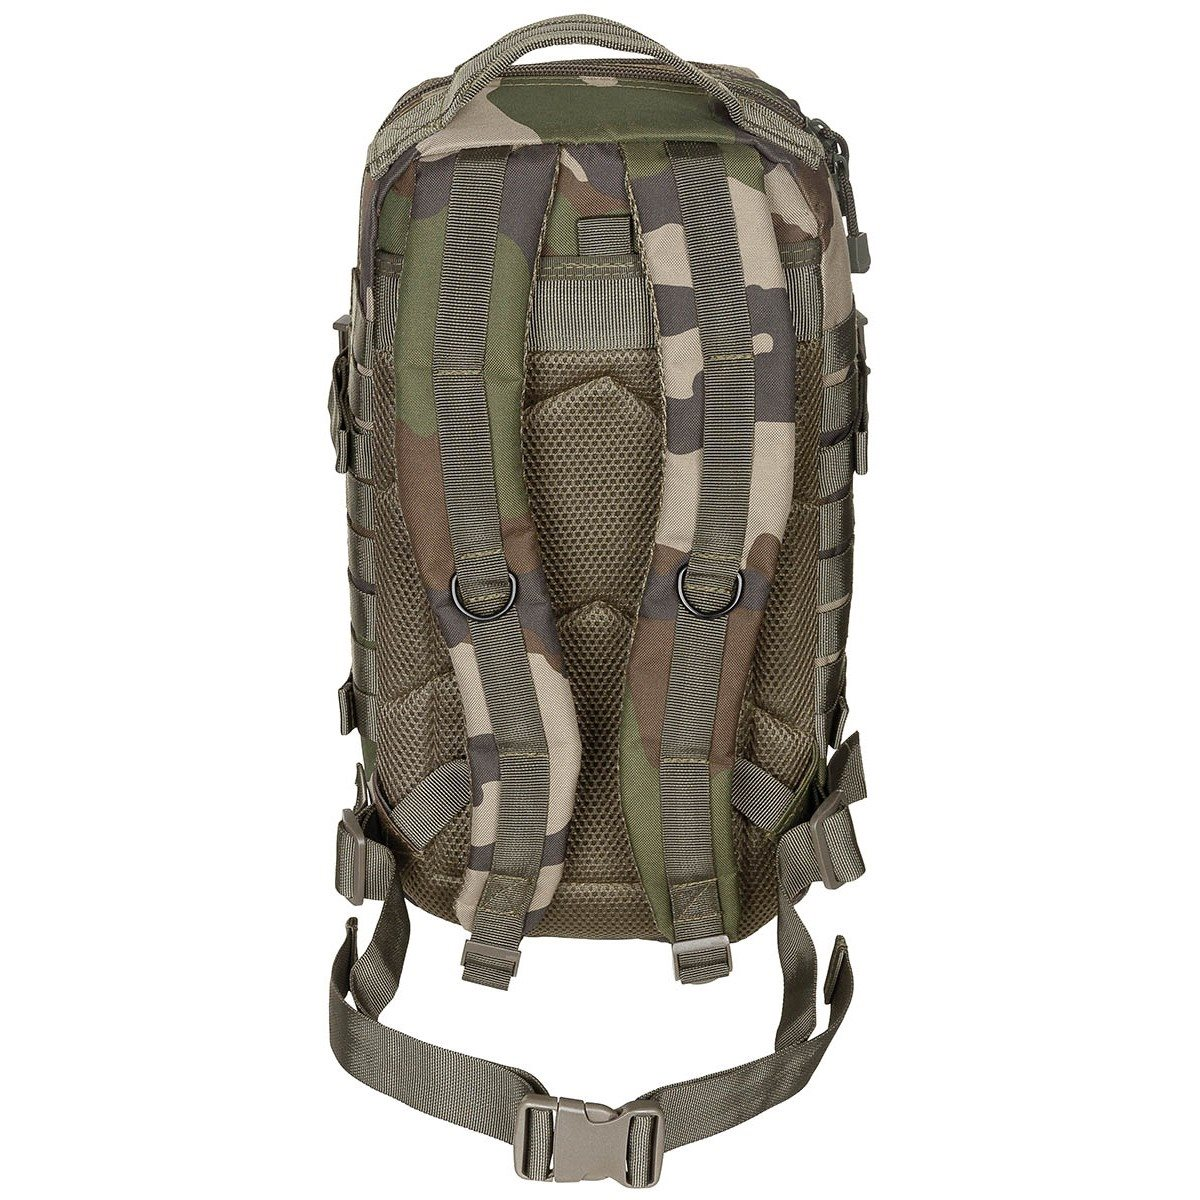 Backpack ASSAULT I CCE TARN MFH int. comp. 30333I L-11